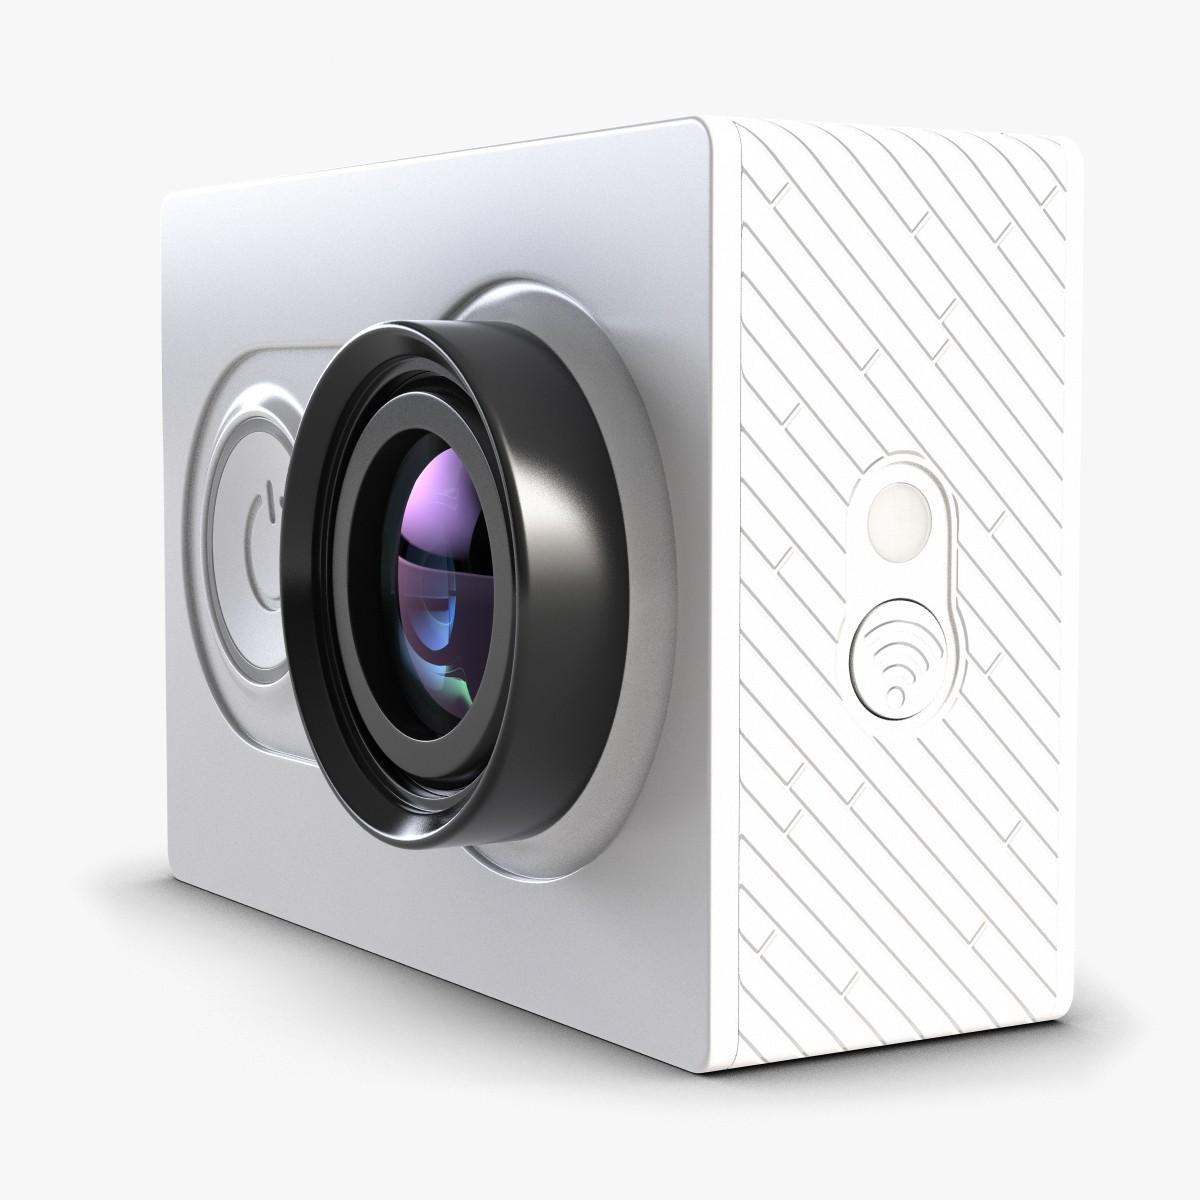 XiaomiYiActionCamera25chk247.jpg434bc9df-56d0-4de6-9a09-610207be6888Original.jpg